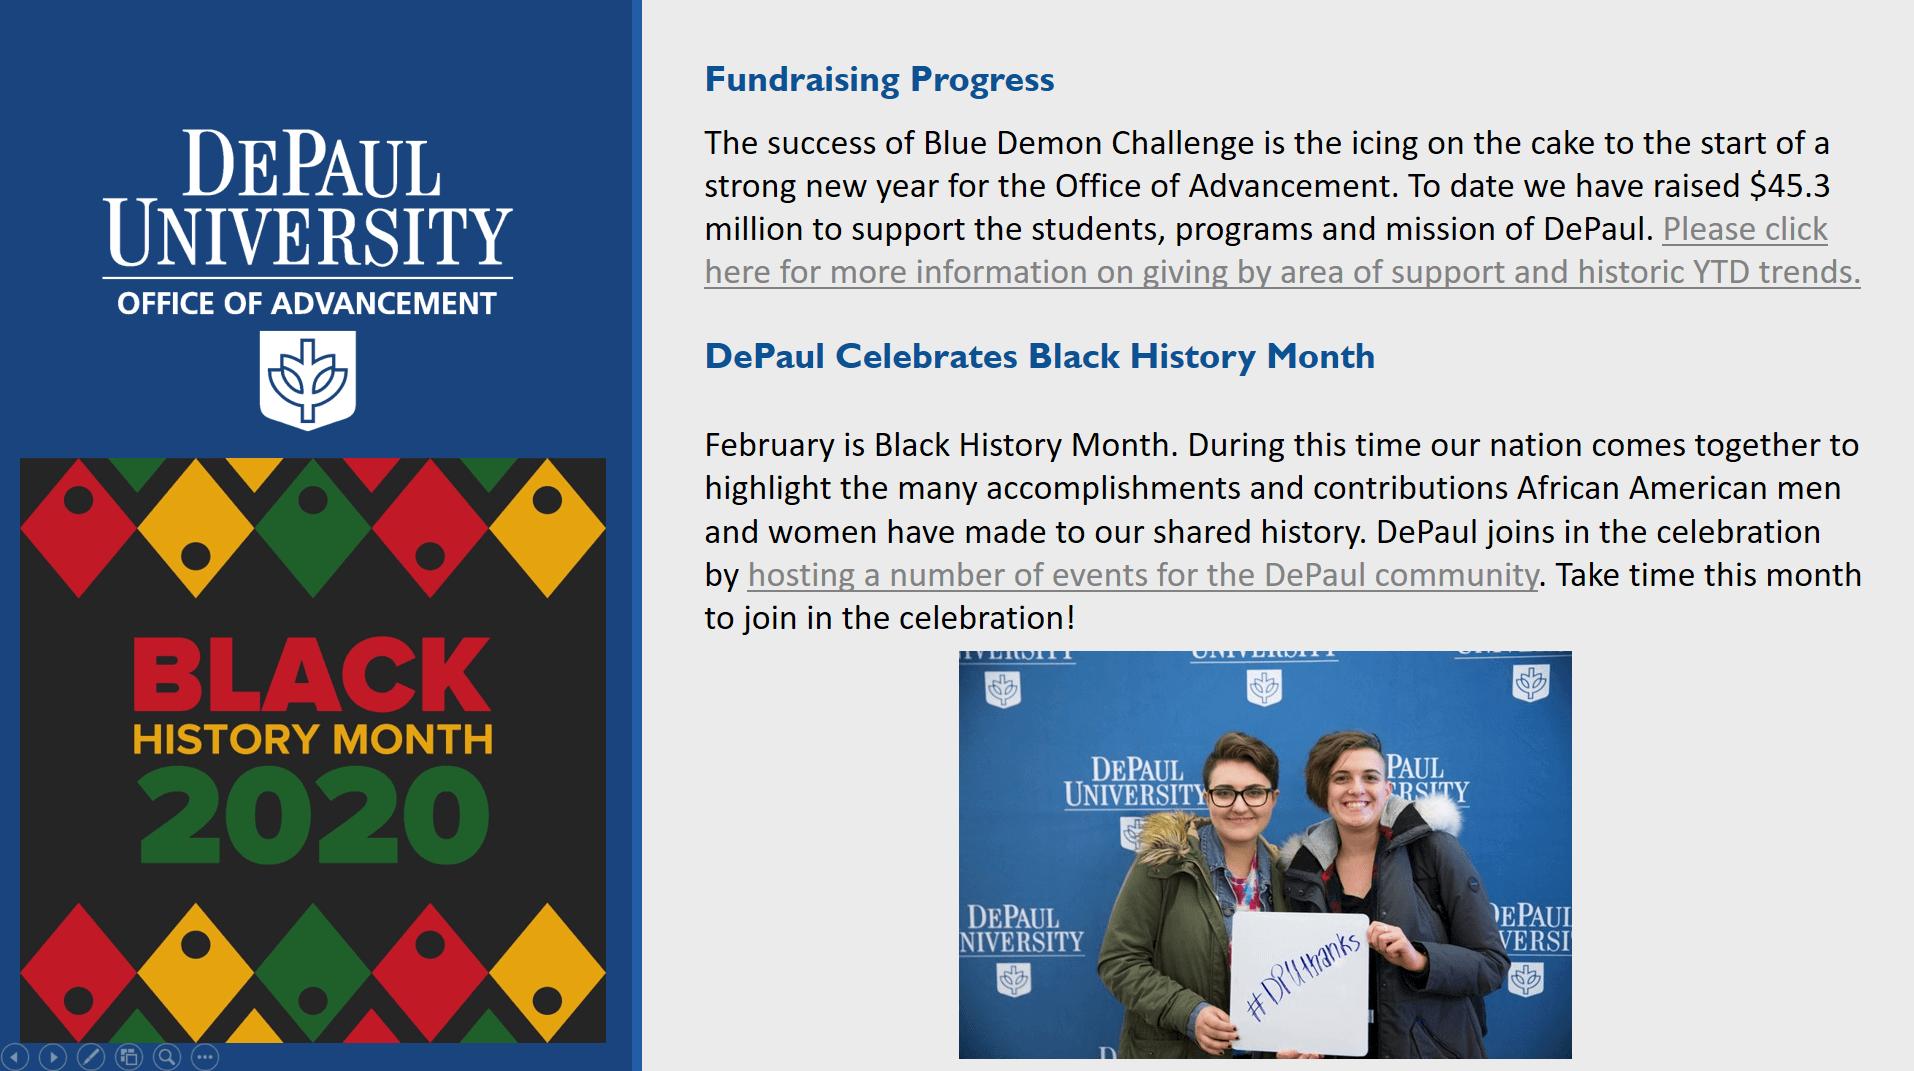 An example of DePaul University's digital signage.